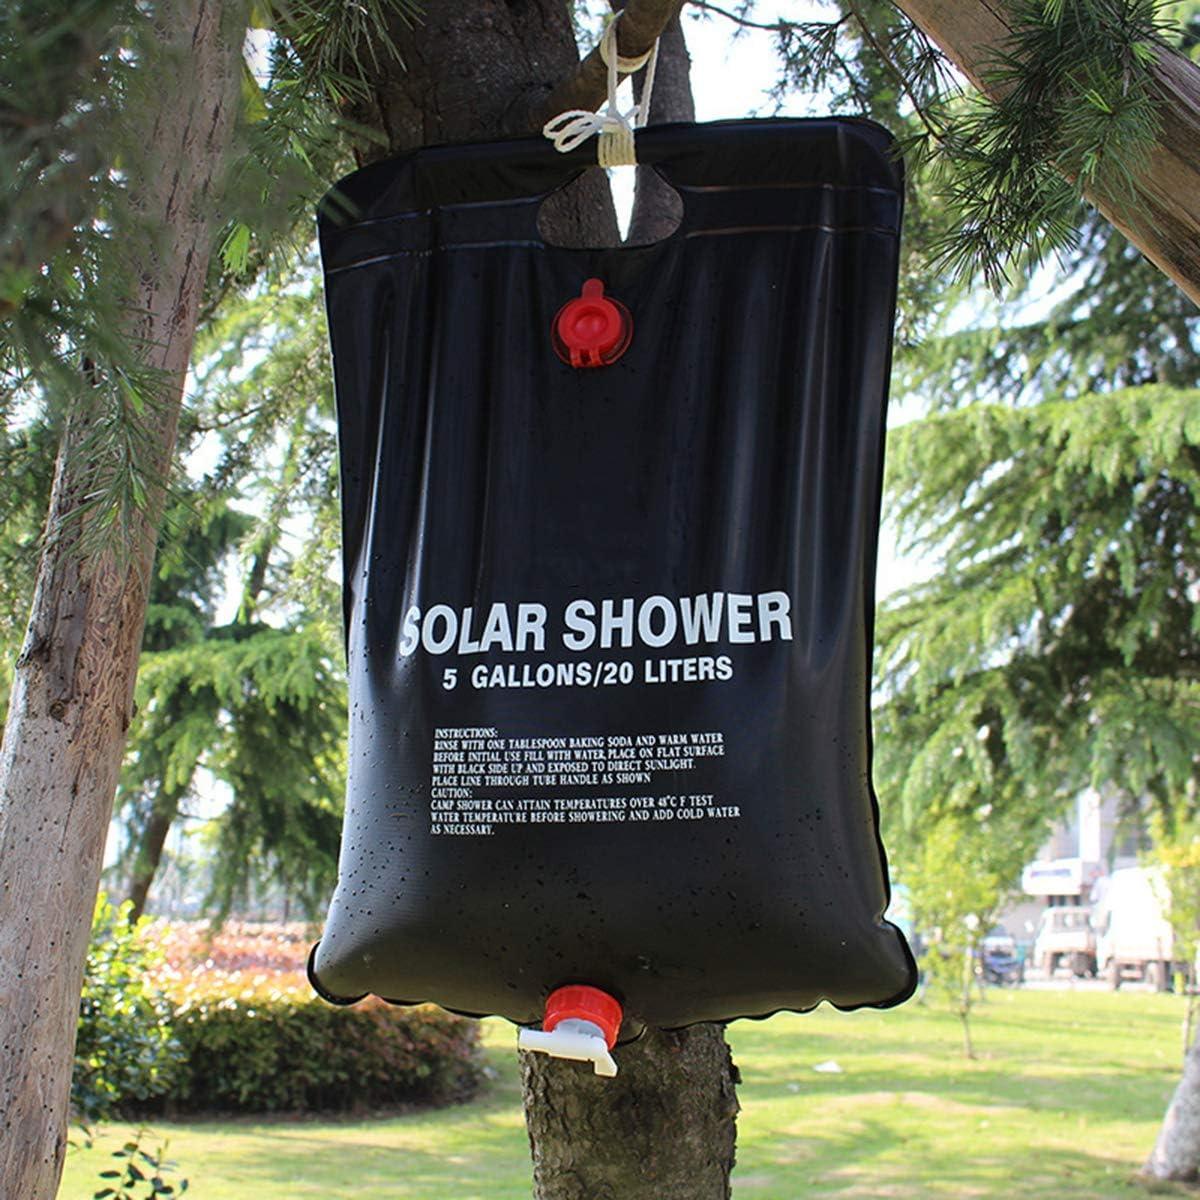 para camping bolsa de ba/ño bolsa de almacenamiento senderismo 20 L con calefacci/ón solar plegable Bolsa de ducha solar para acampada ligera port/átil OhhGo